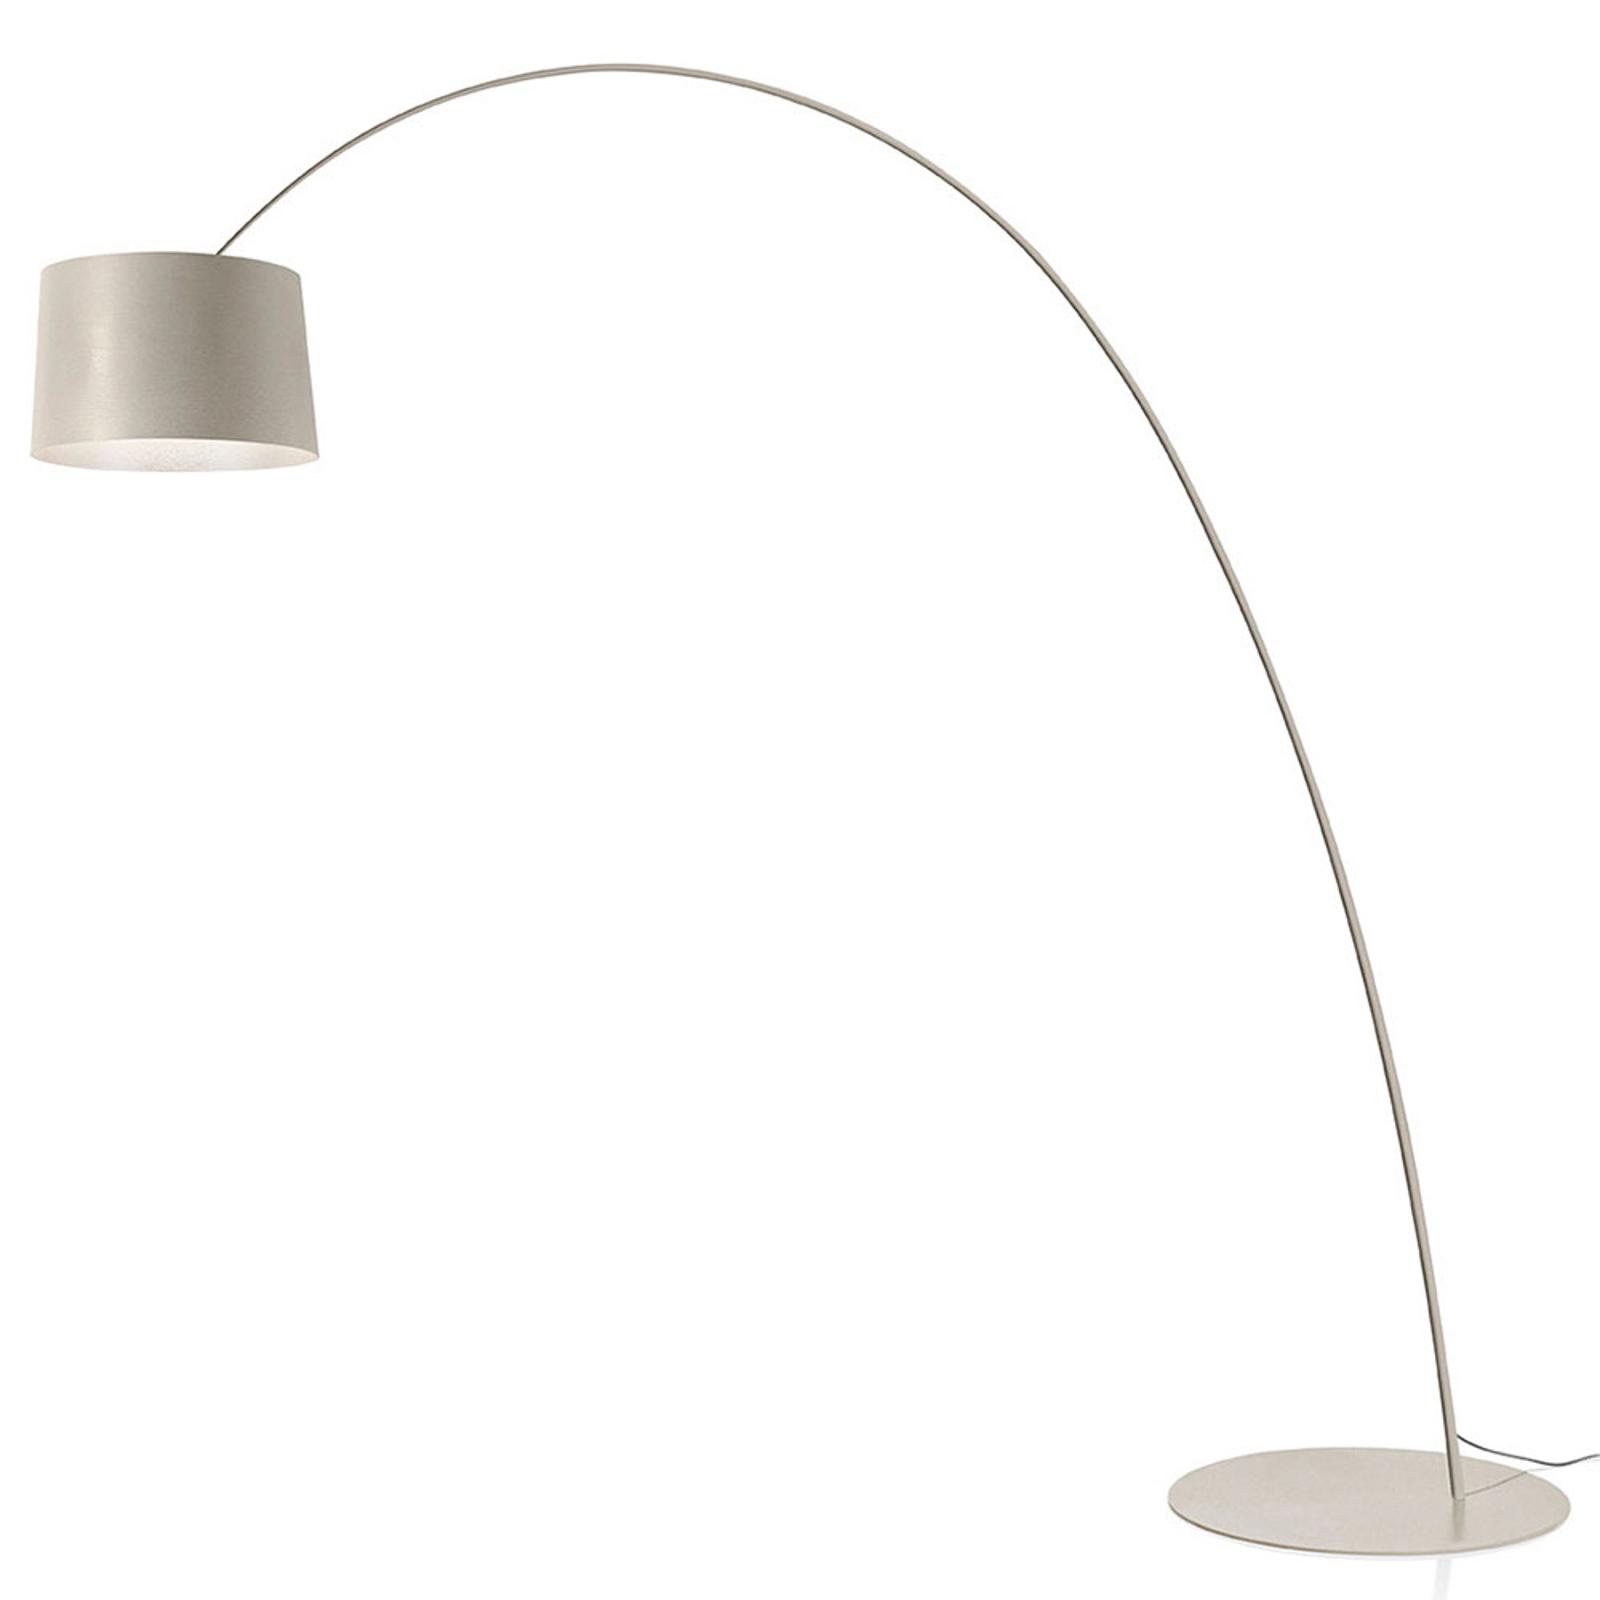 Foscarini Twiggy MyLight LED-golvlampa gråbeige